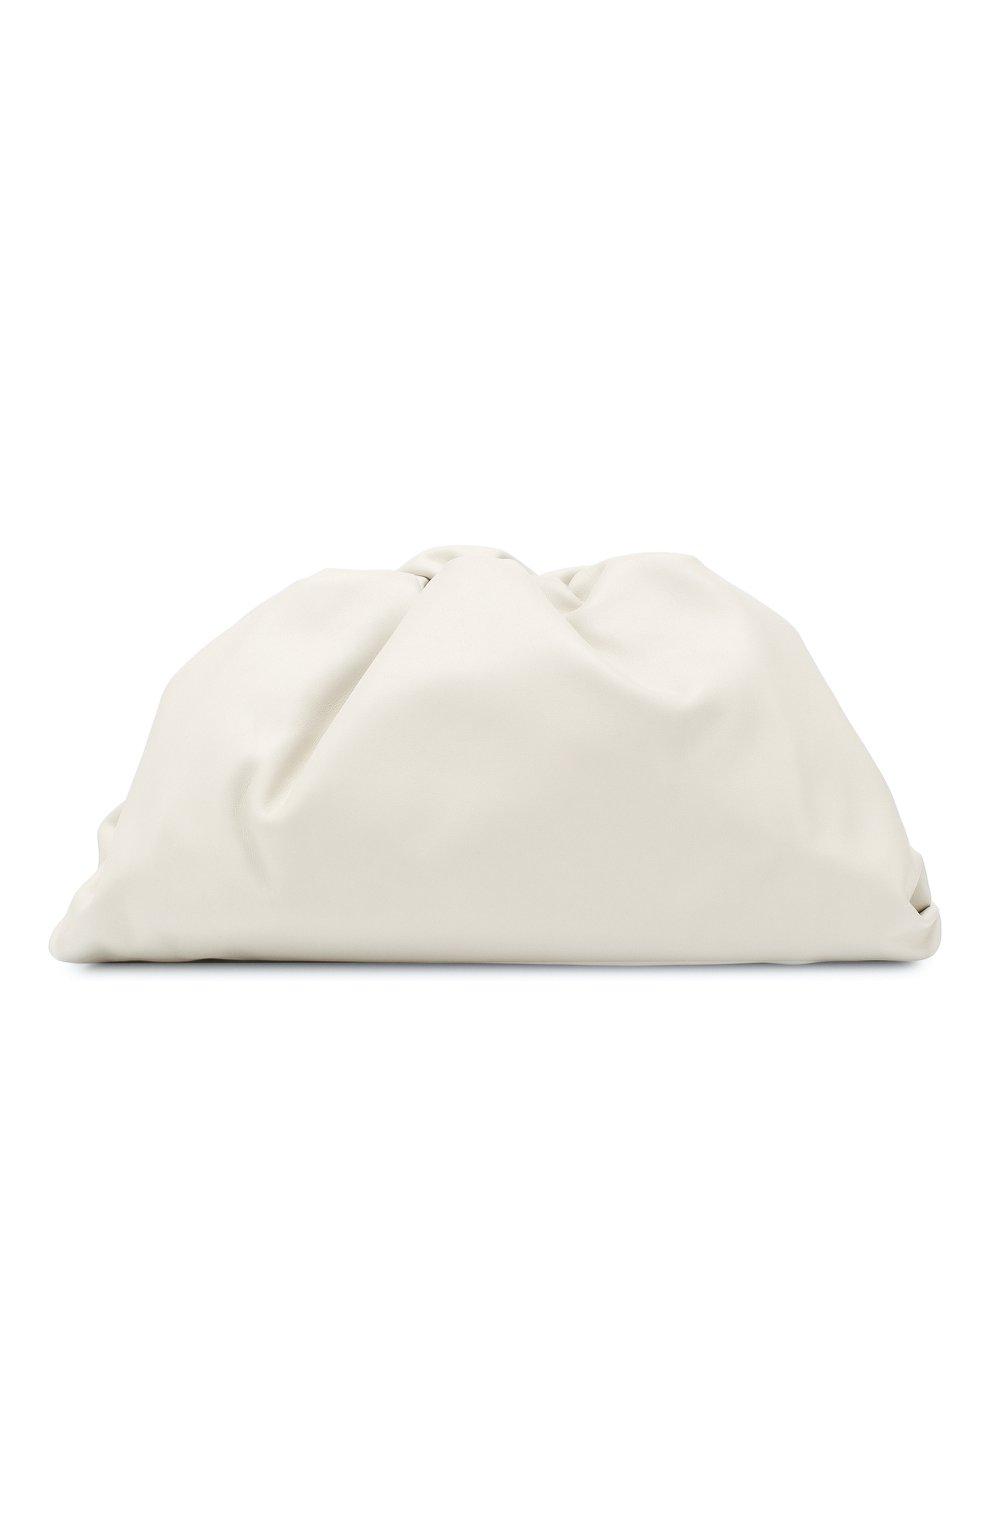 Женский клатч pouch BOTTEGA VENETA белого цвета, арт. 576227/VCP40   Фото 1